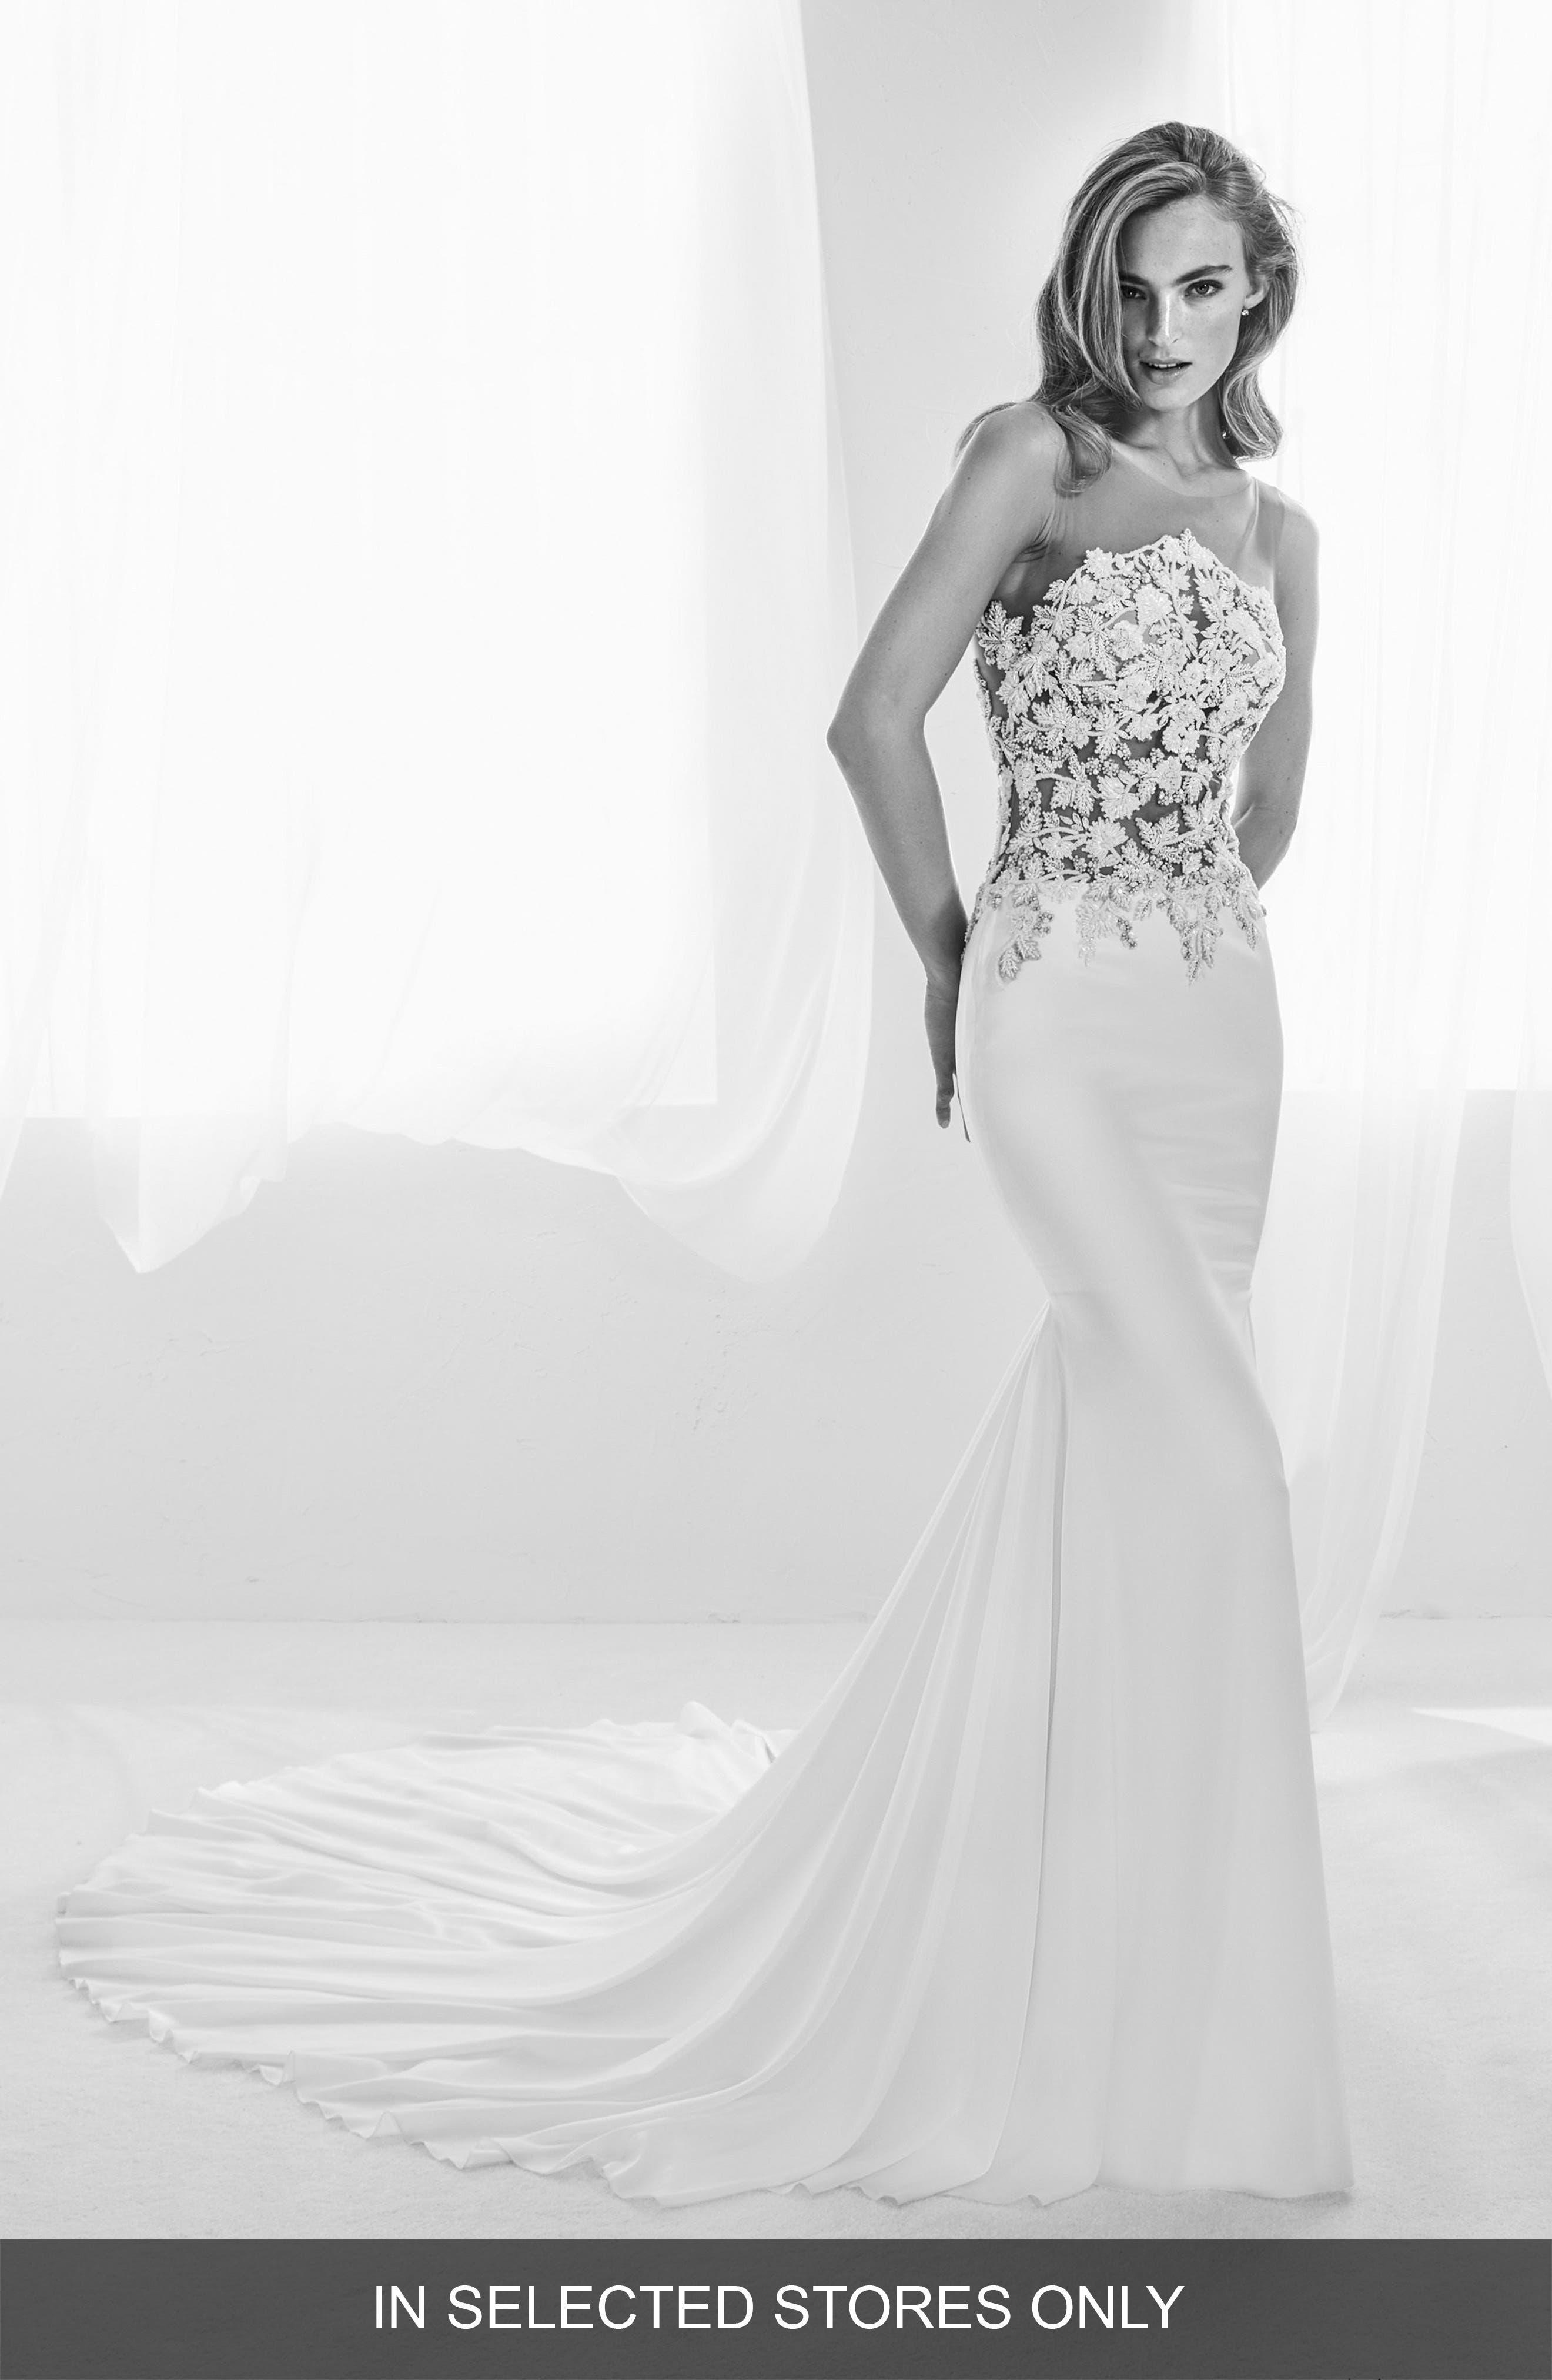 a07e3b0280 Atelier Pronovias Wedding Dresses   Bridal Gowns